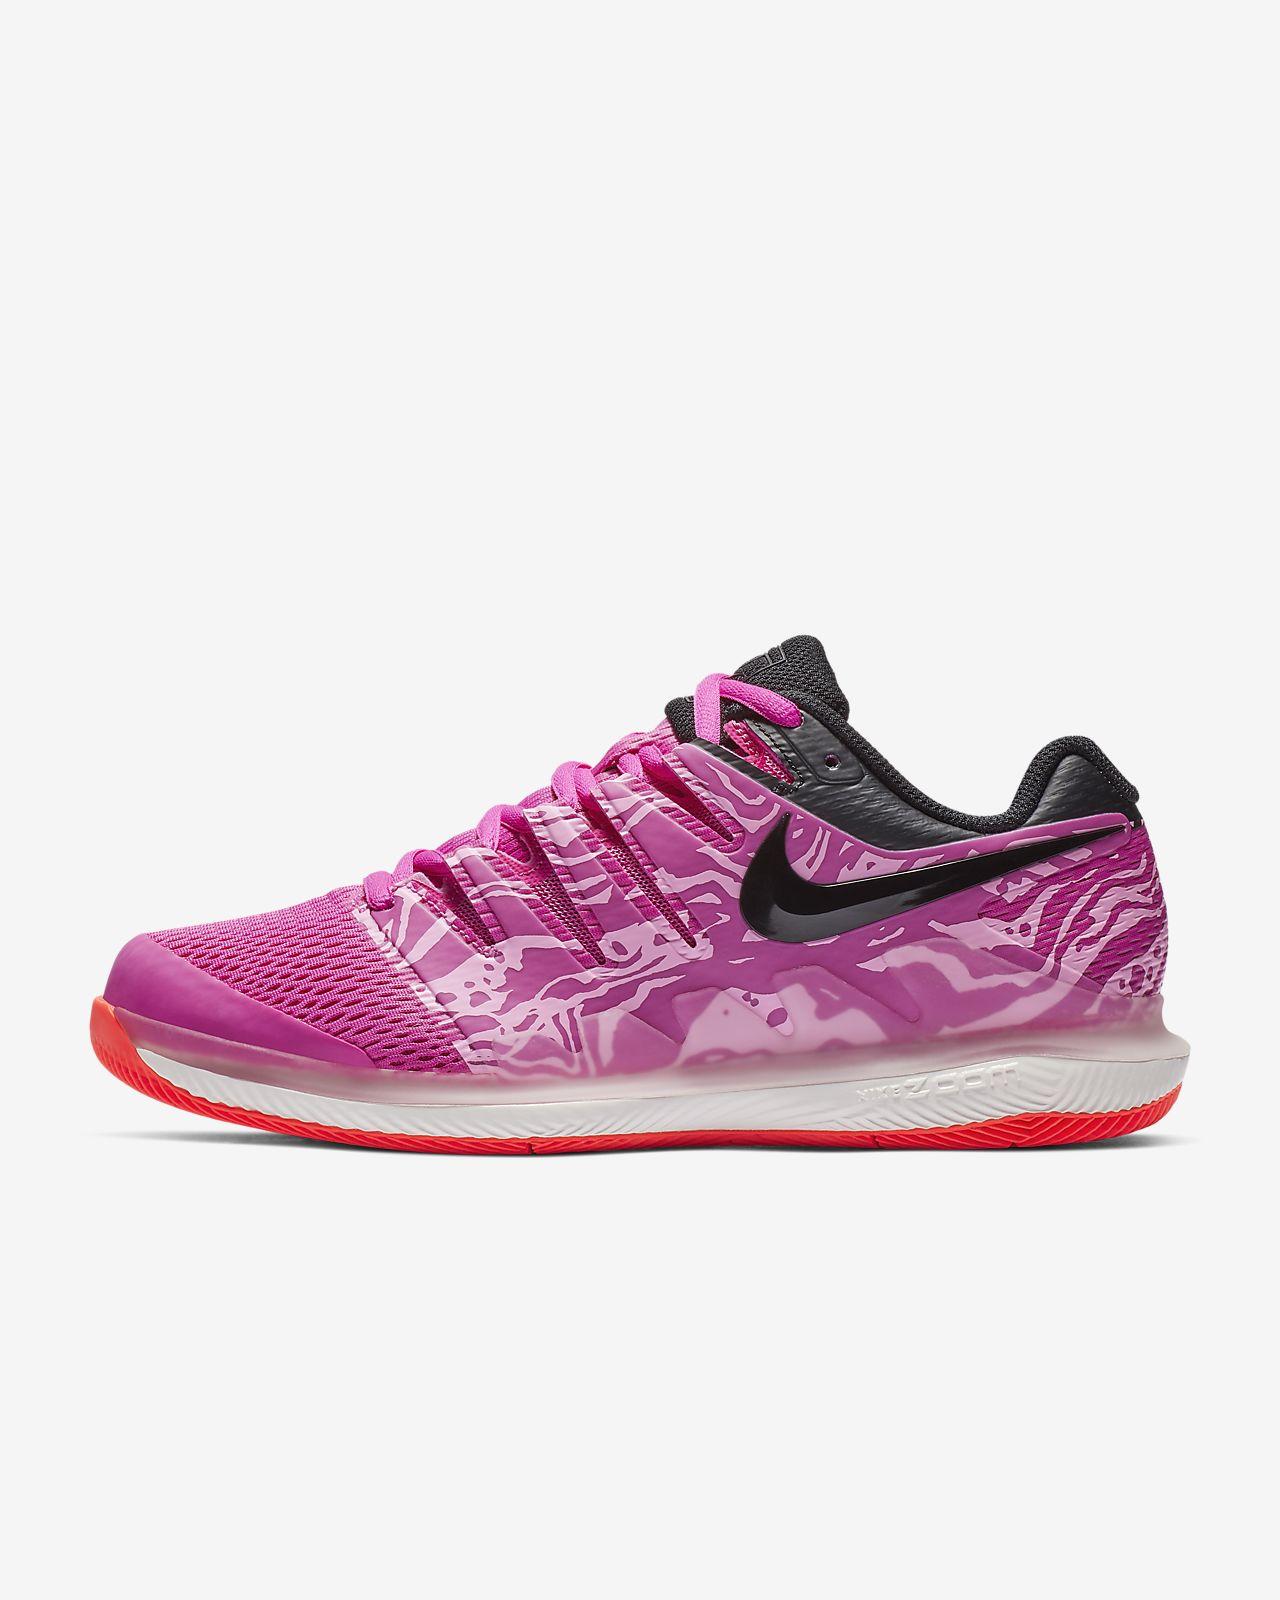 1fb5c92d1d8 ... Sapatilhas de ténis para piso duro NikeCourt Air Zoom Vapor X para  mulher